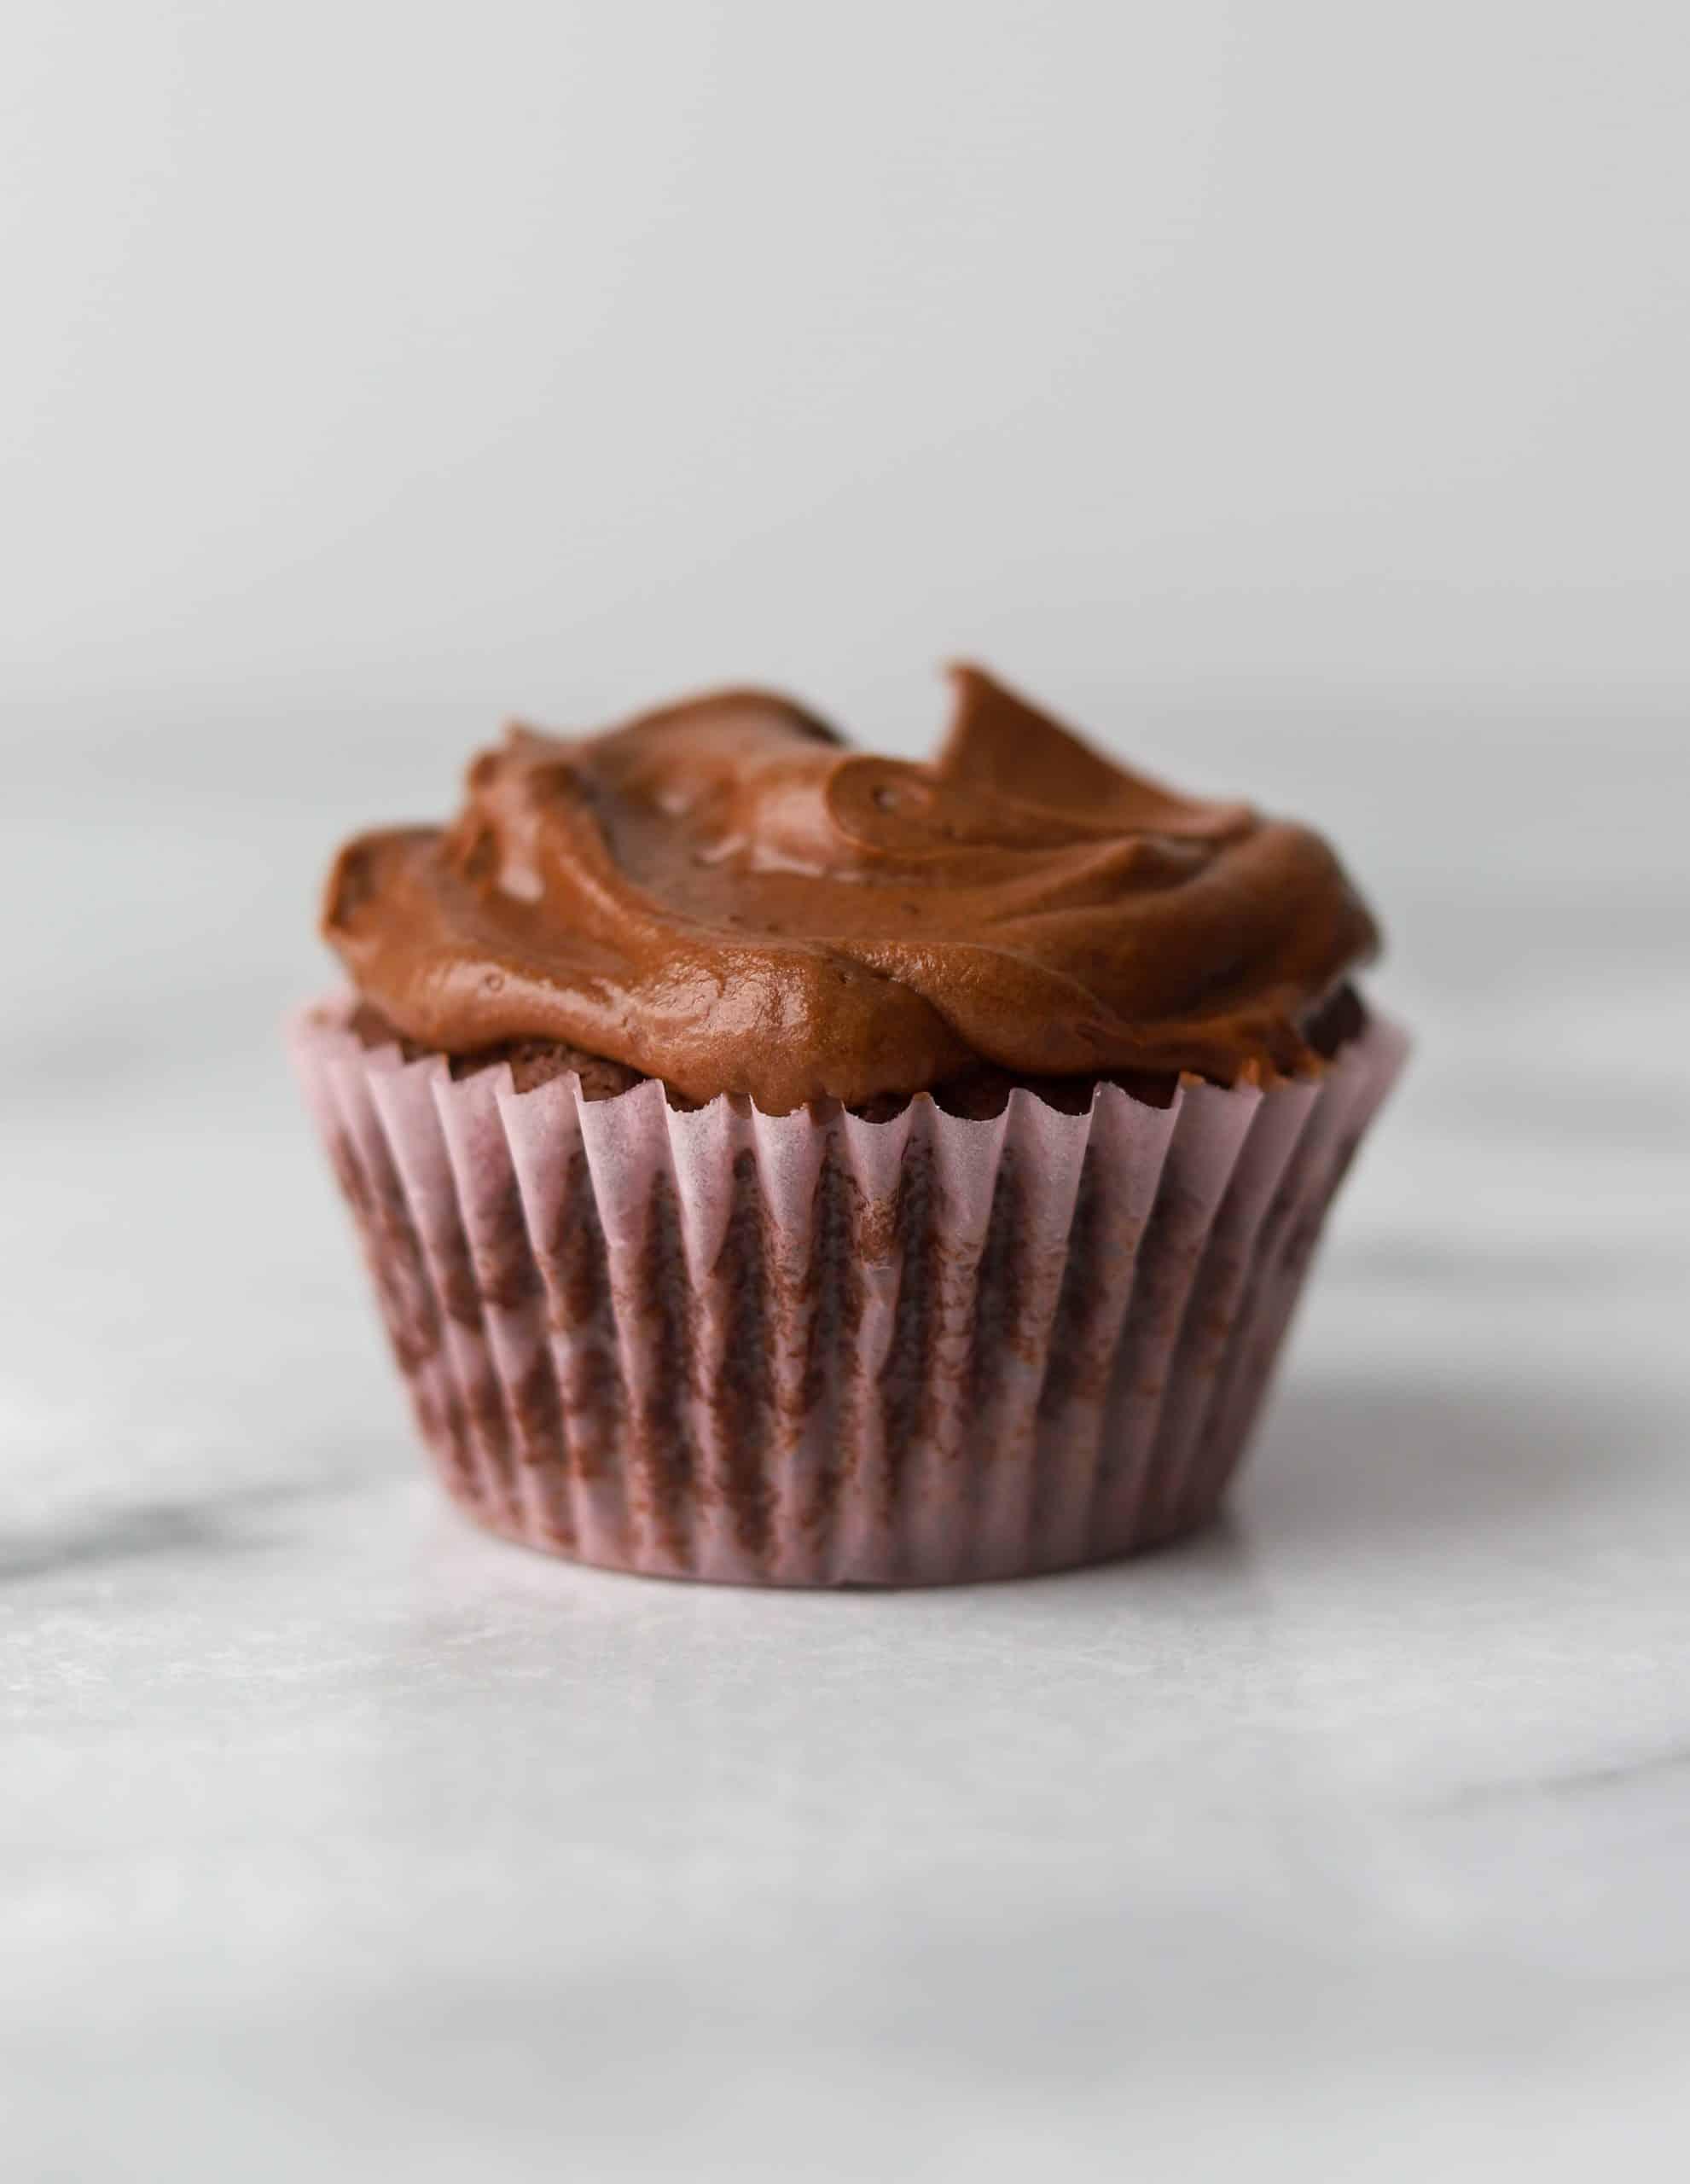 Dark chocolate cupcake on a marble top